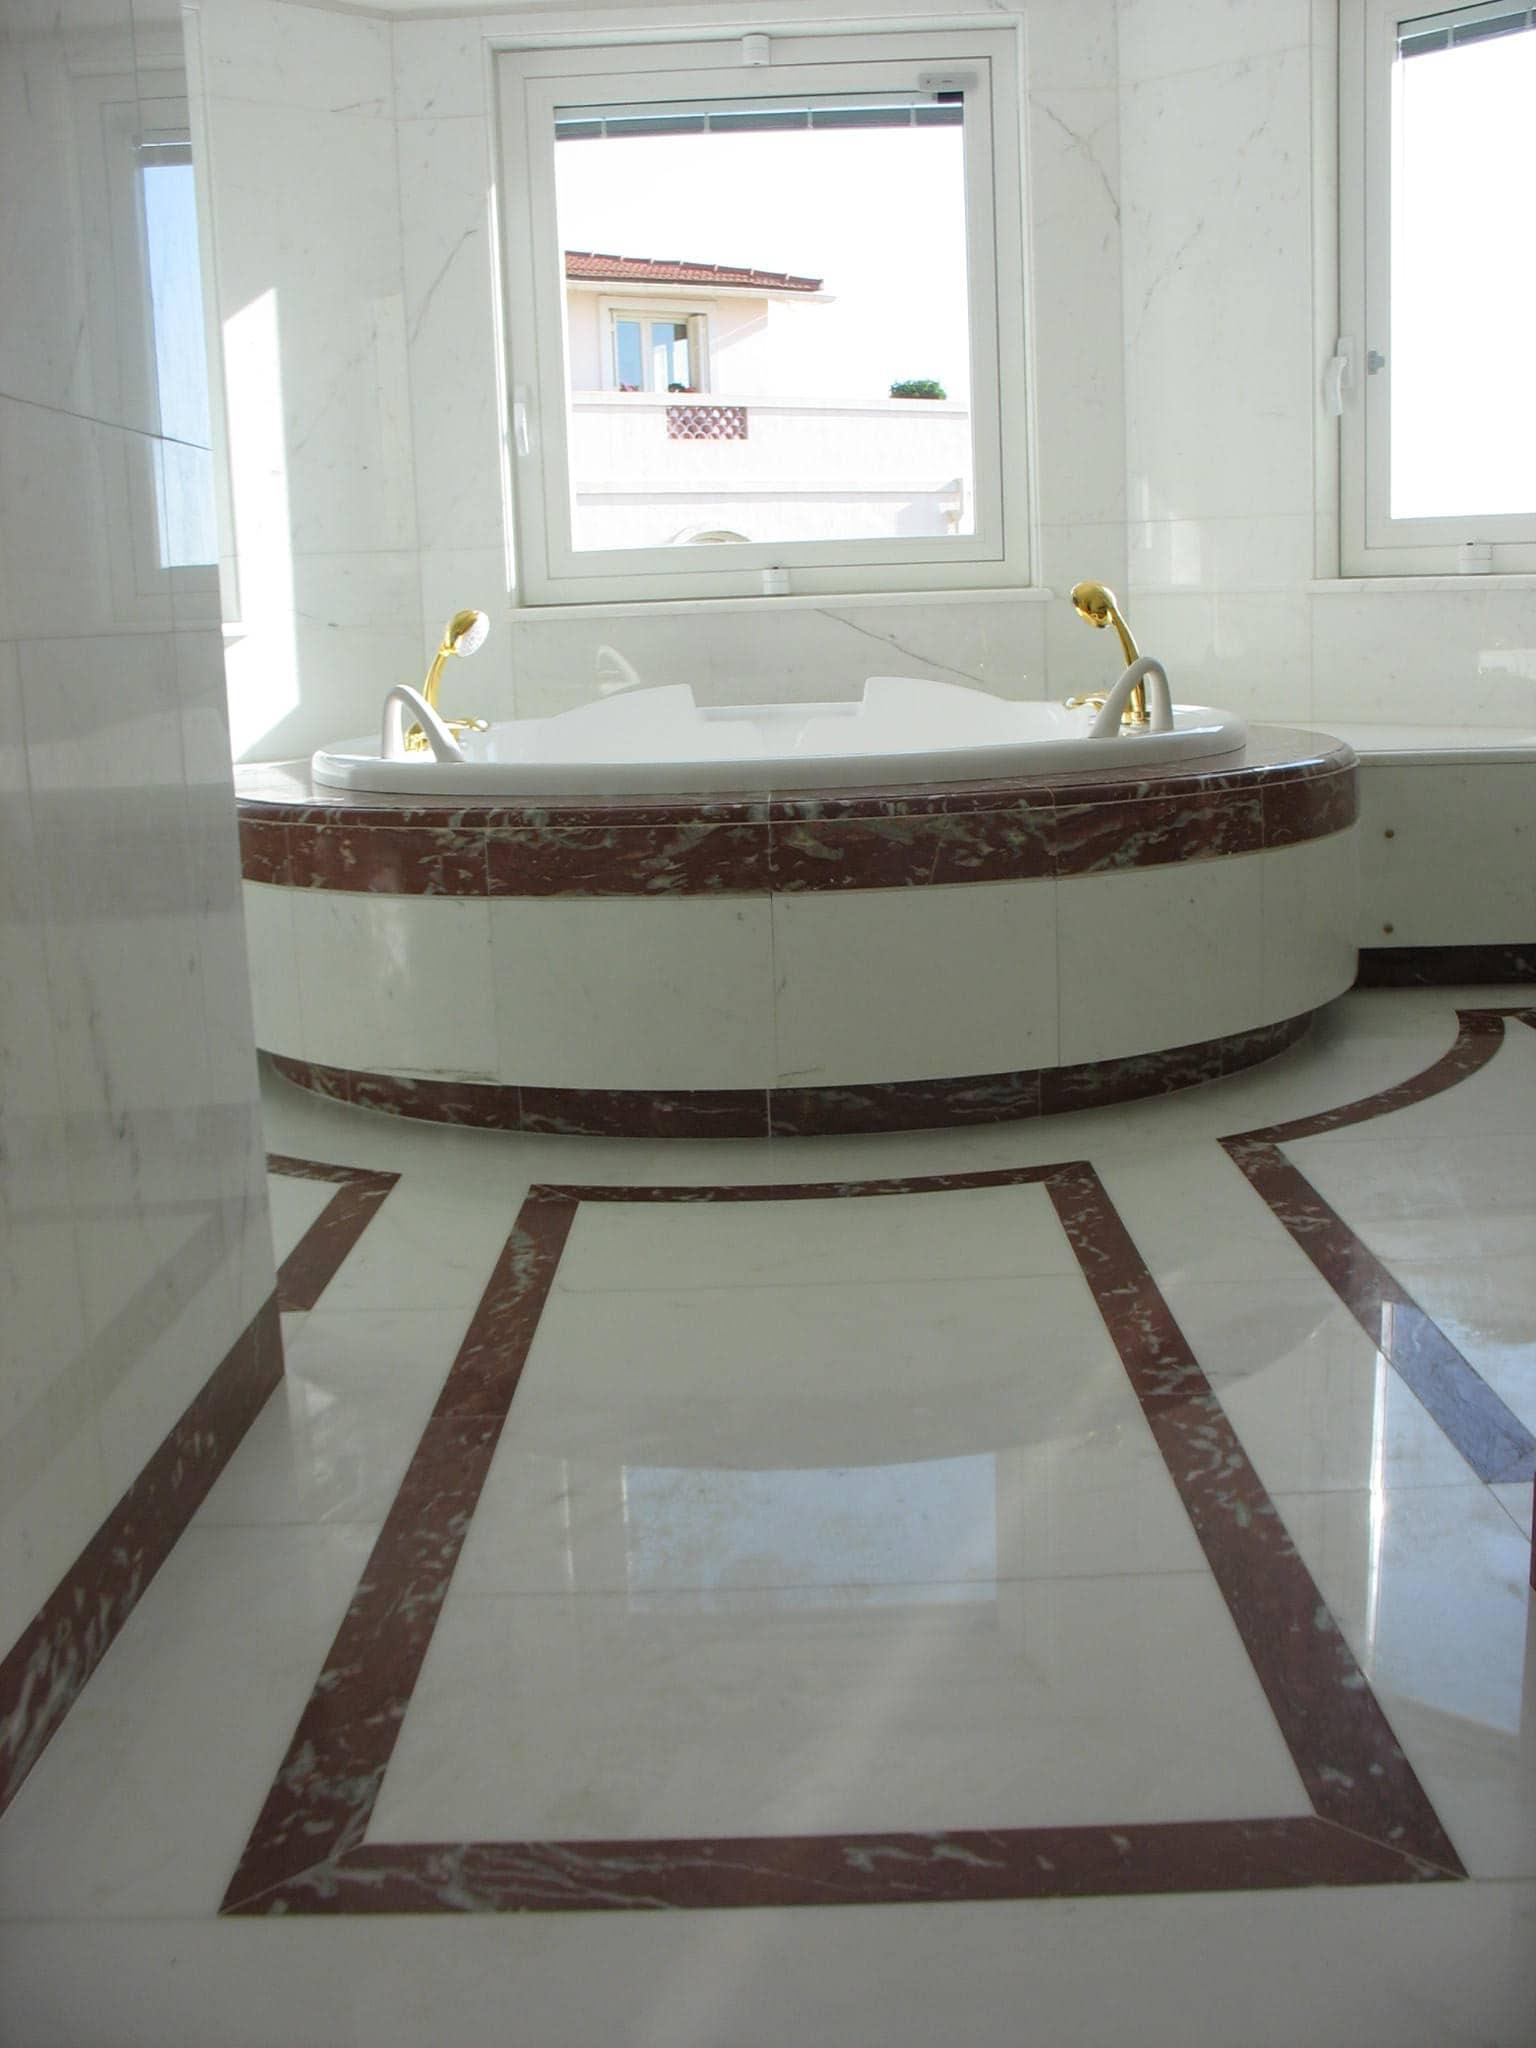 Marmo rosso francia marmo - Bagno marmo bianco ...